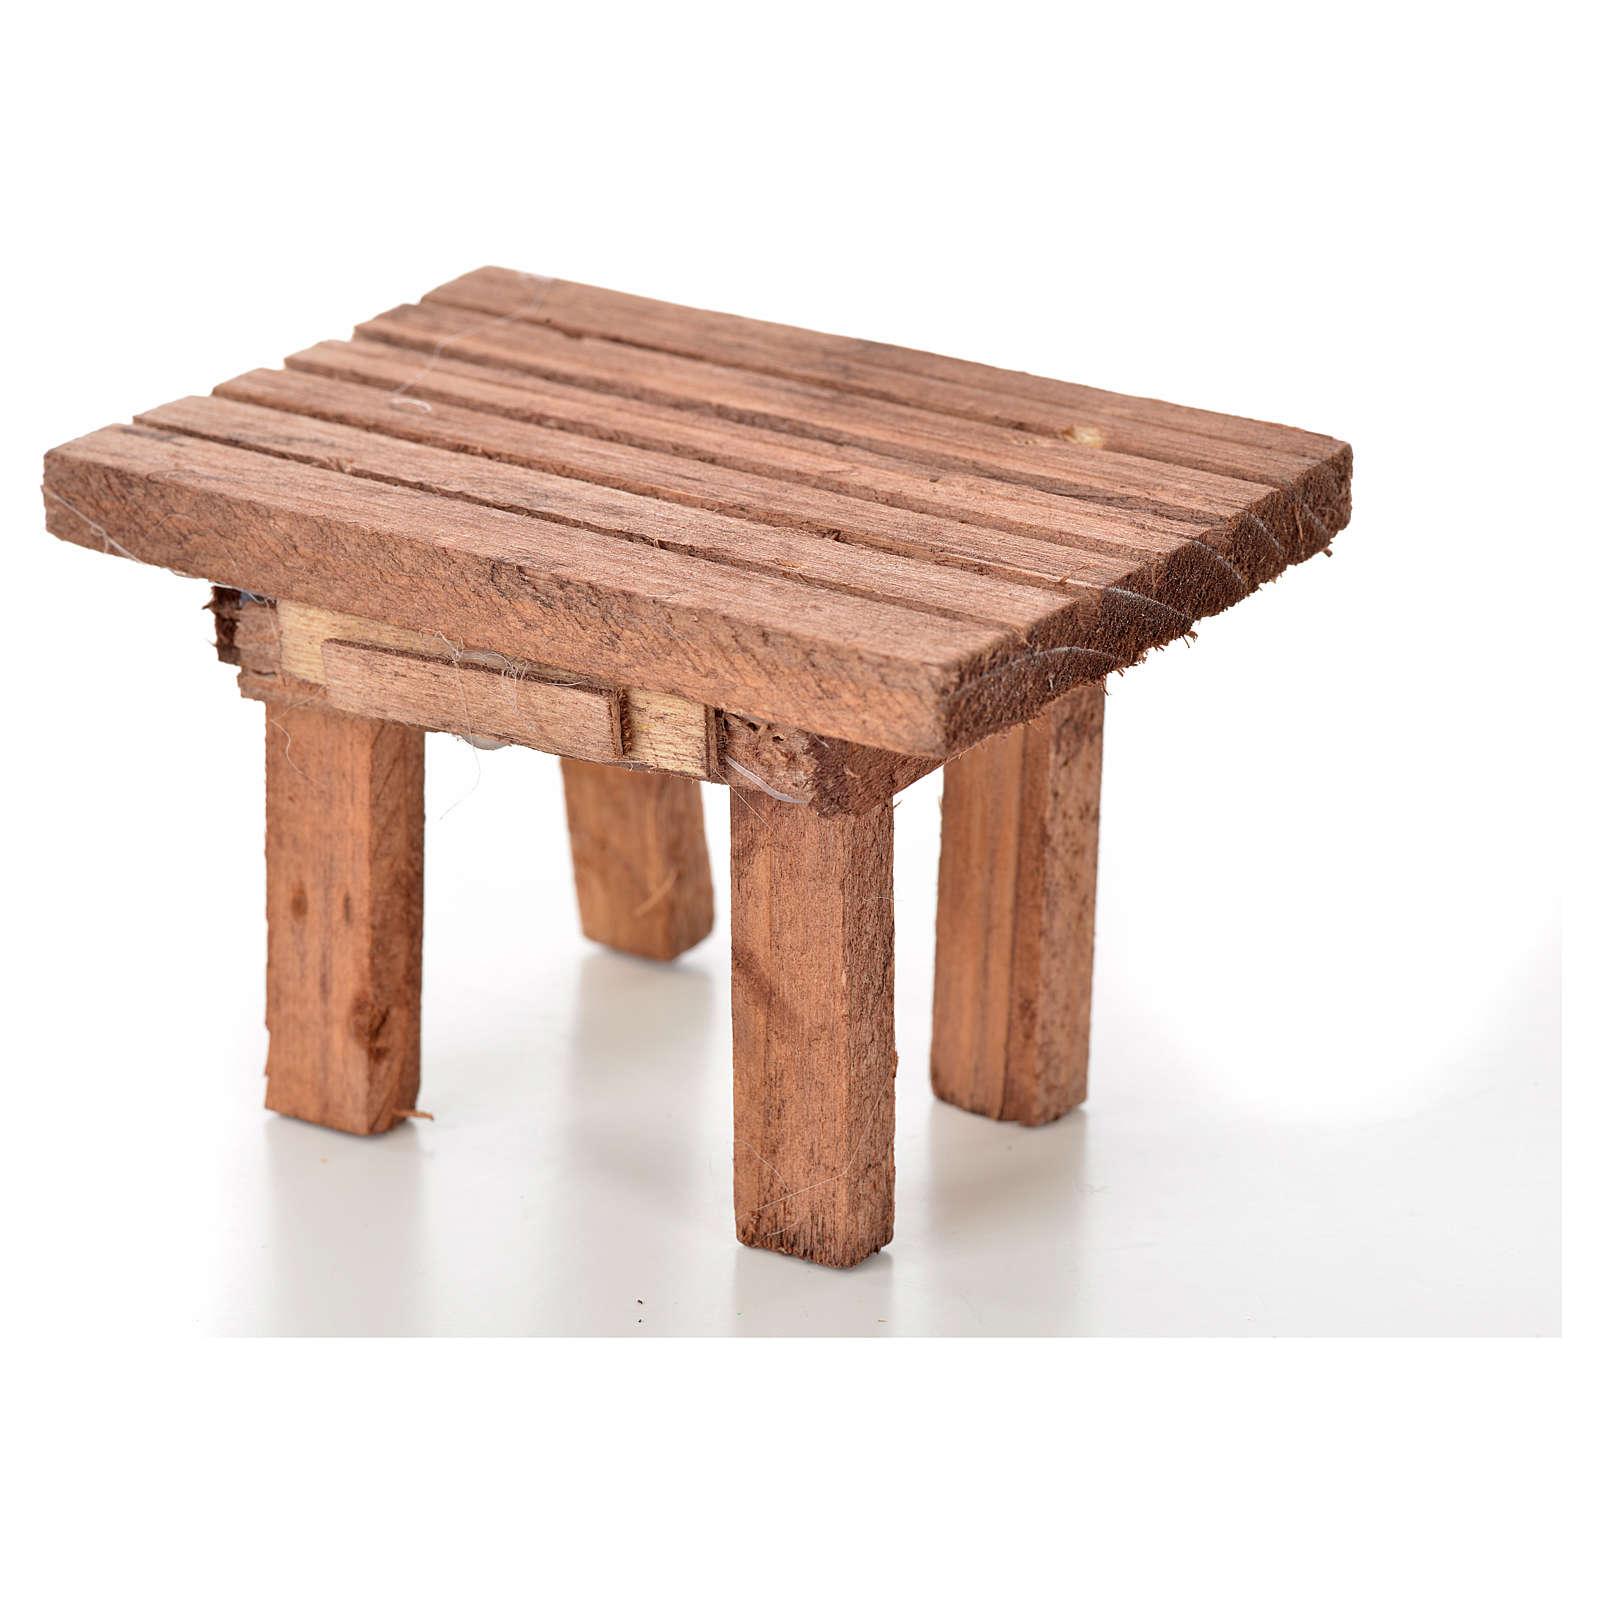 Nativity accessory, wooden table 8.5x6x5.5cm 4